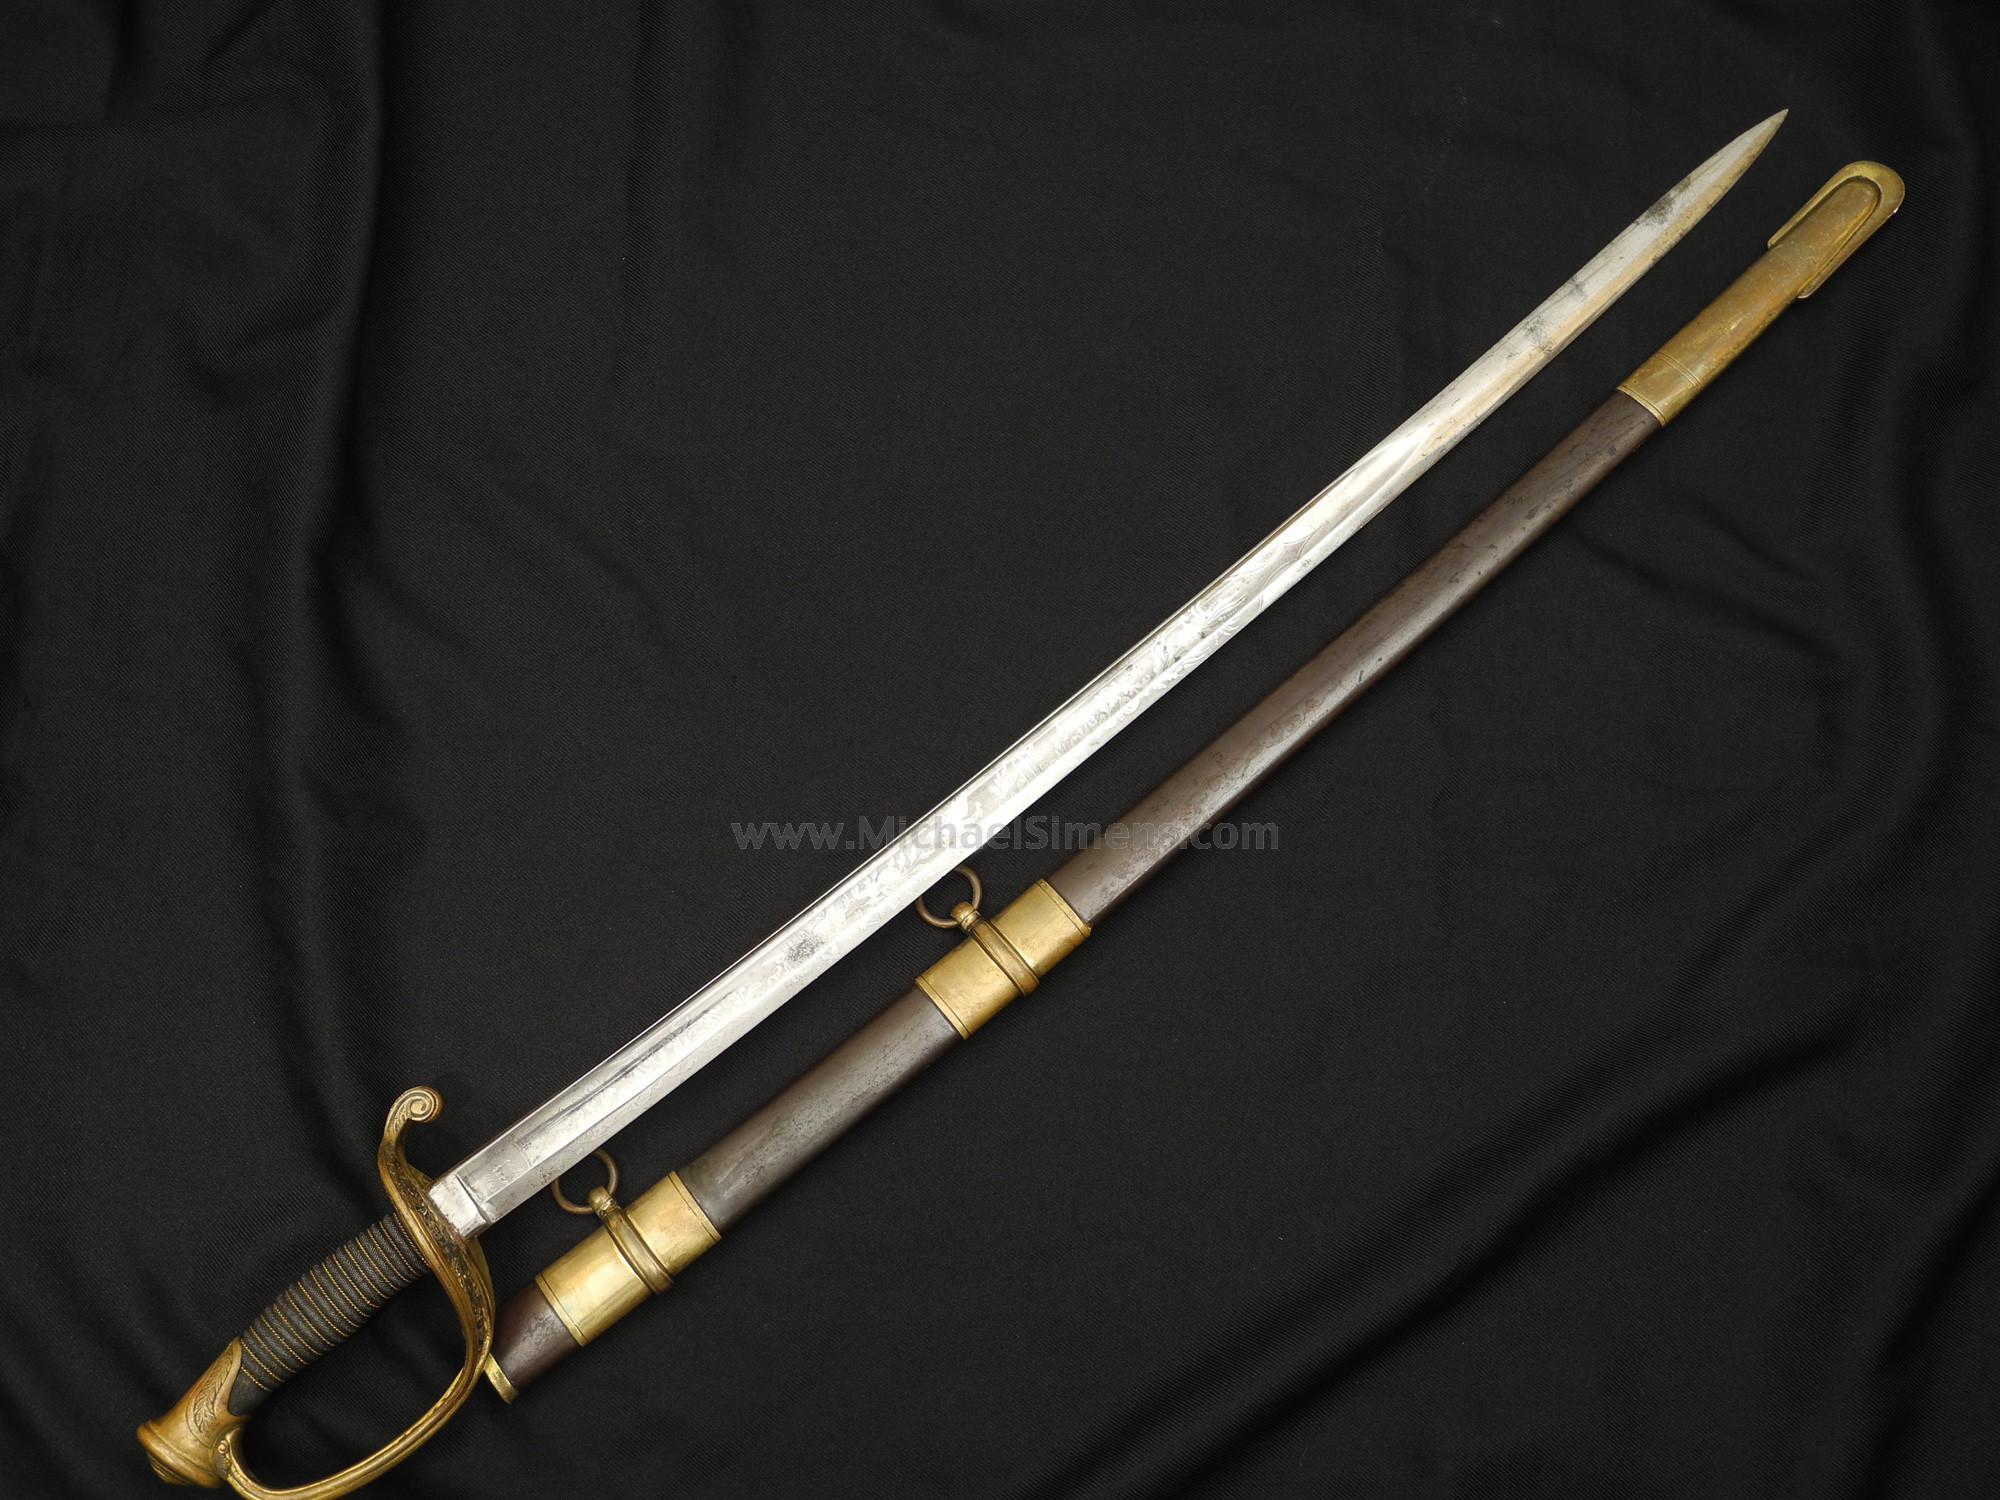 CIVIL WAR GENERAL SWORD - CIVIL WAR SWORD BUYER, DEALER, APPRAISER